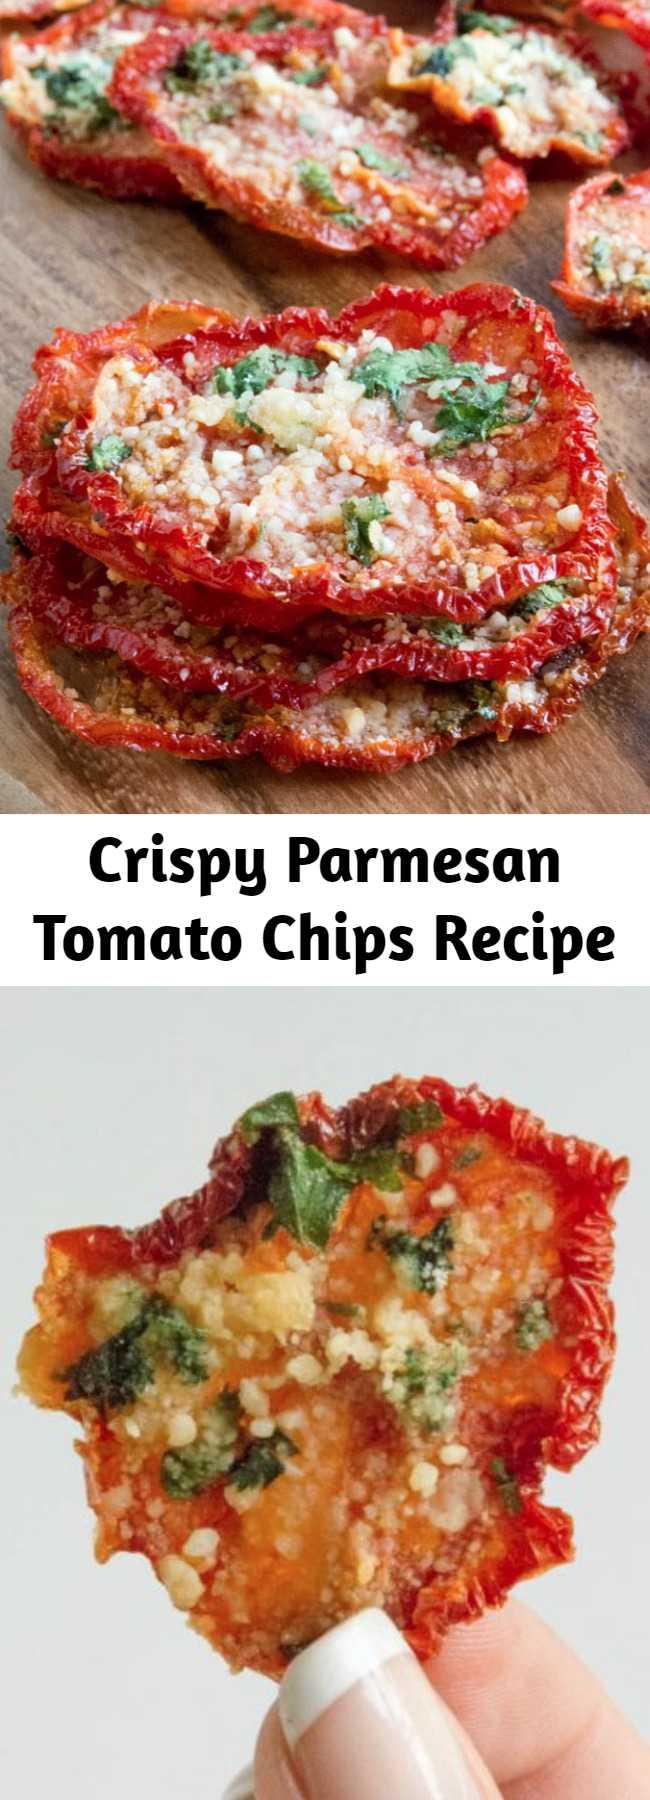 Crispy Parmesan Tomato Chips Recipe - Crispy Parmesan Tomato Chips, low carb, gluten free and amazing!